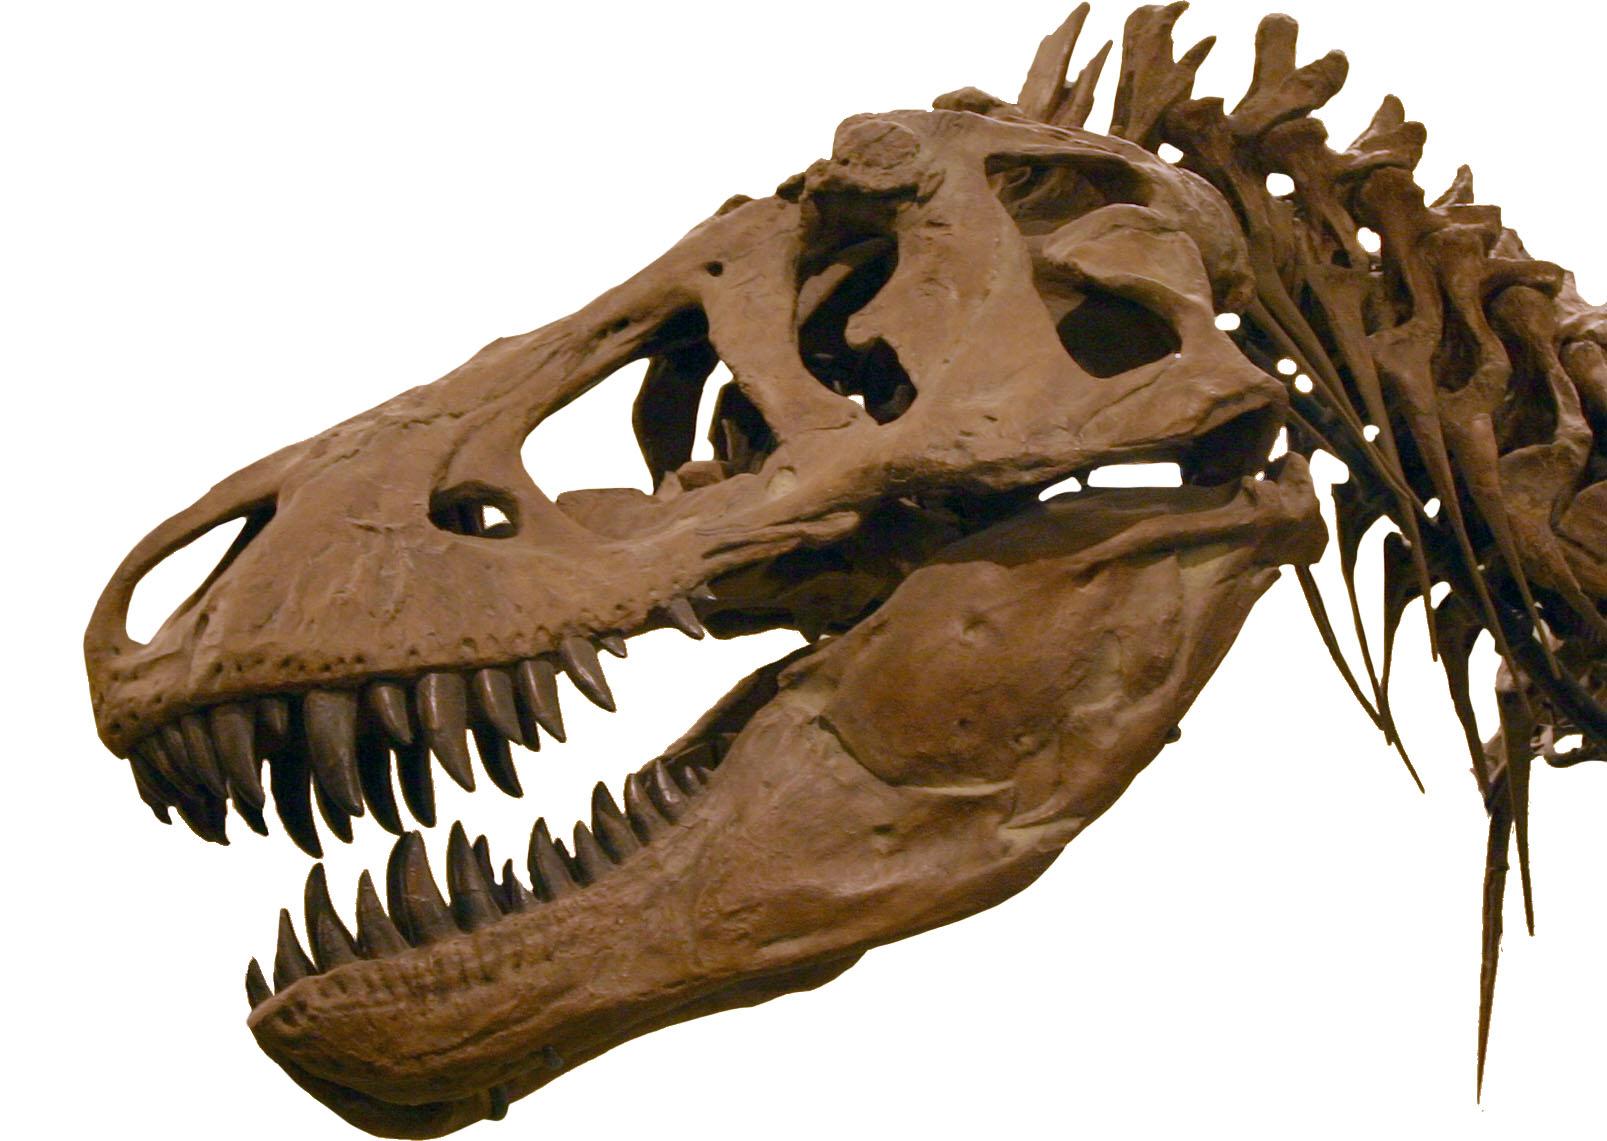 https://upload.wikimedia.org/wikipedia/commons/5/58/T-Rex2.jpg